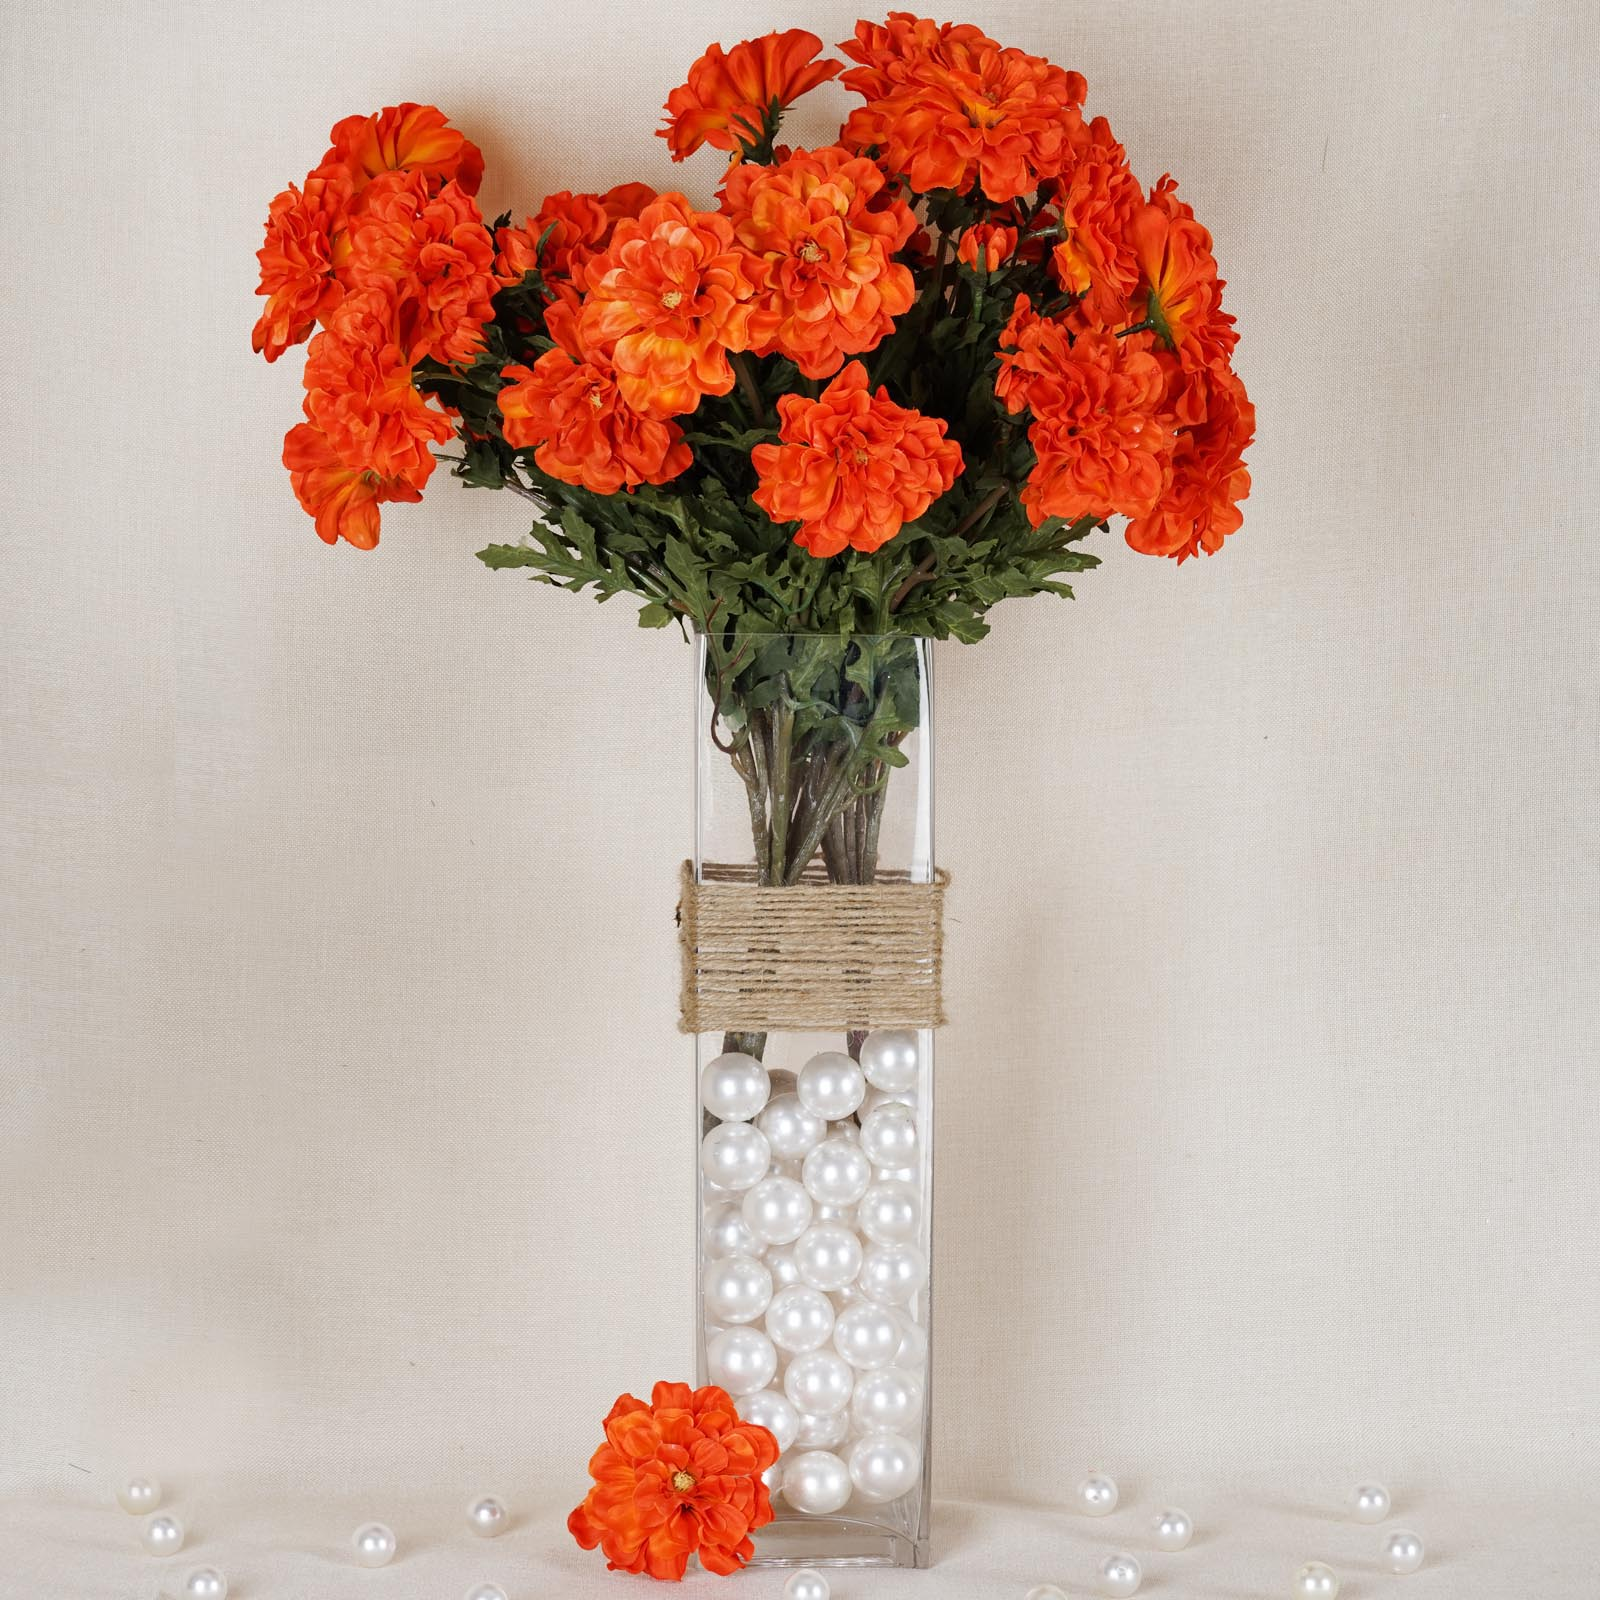 BalsaCircle 4 California Zinnia Artificial Wedding Craft Flowers - DIY Home Party Bouquets Arrangements Centerpieces